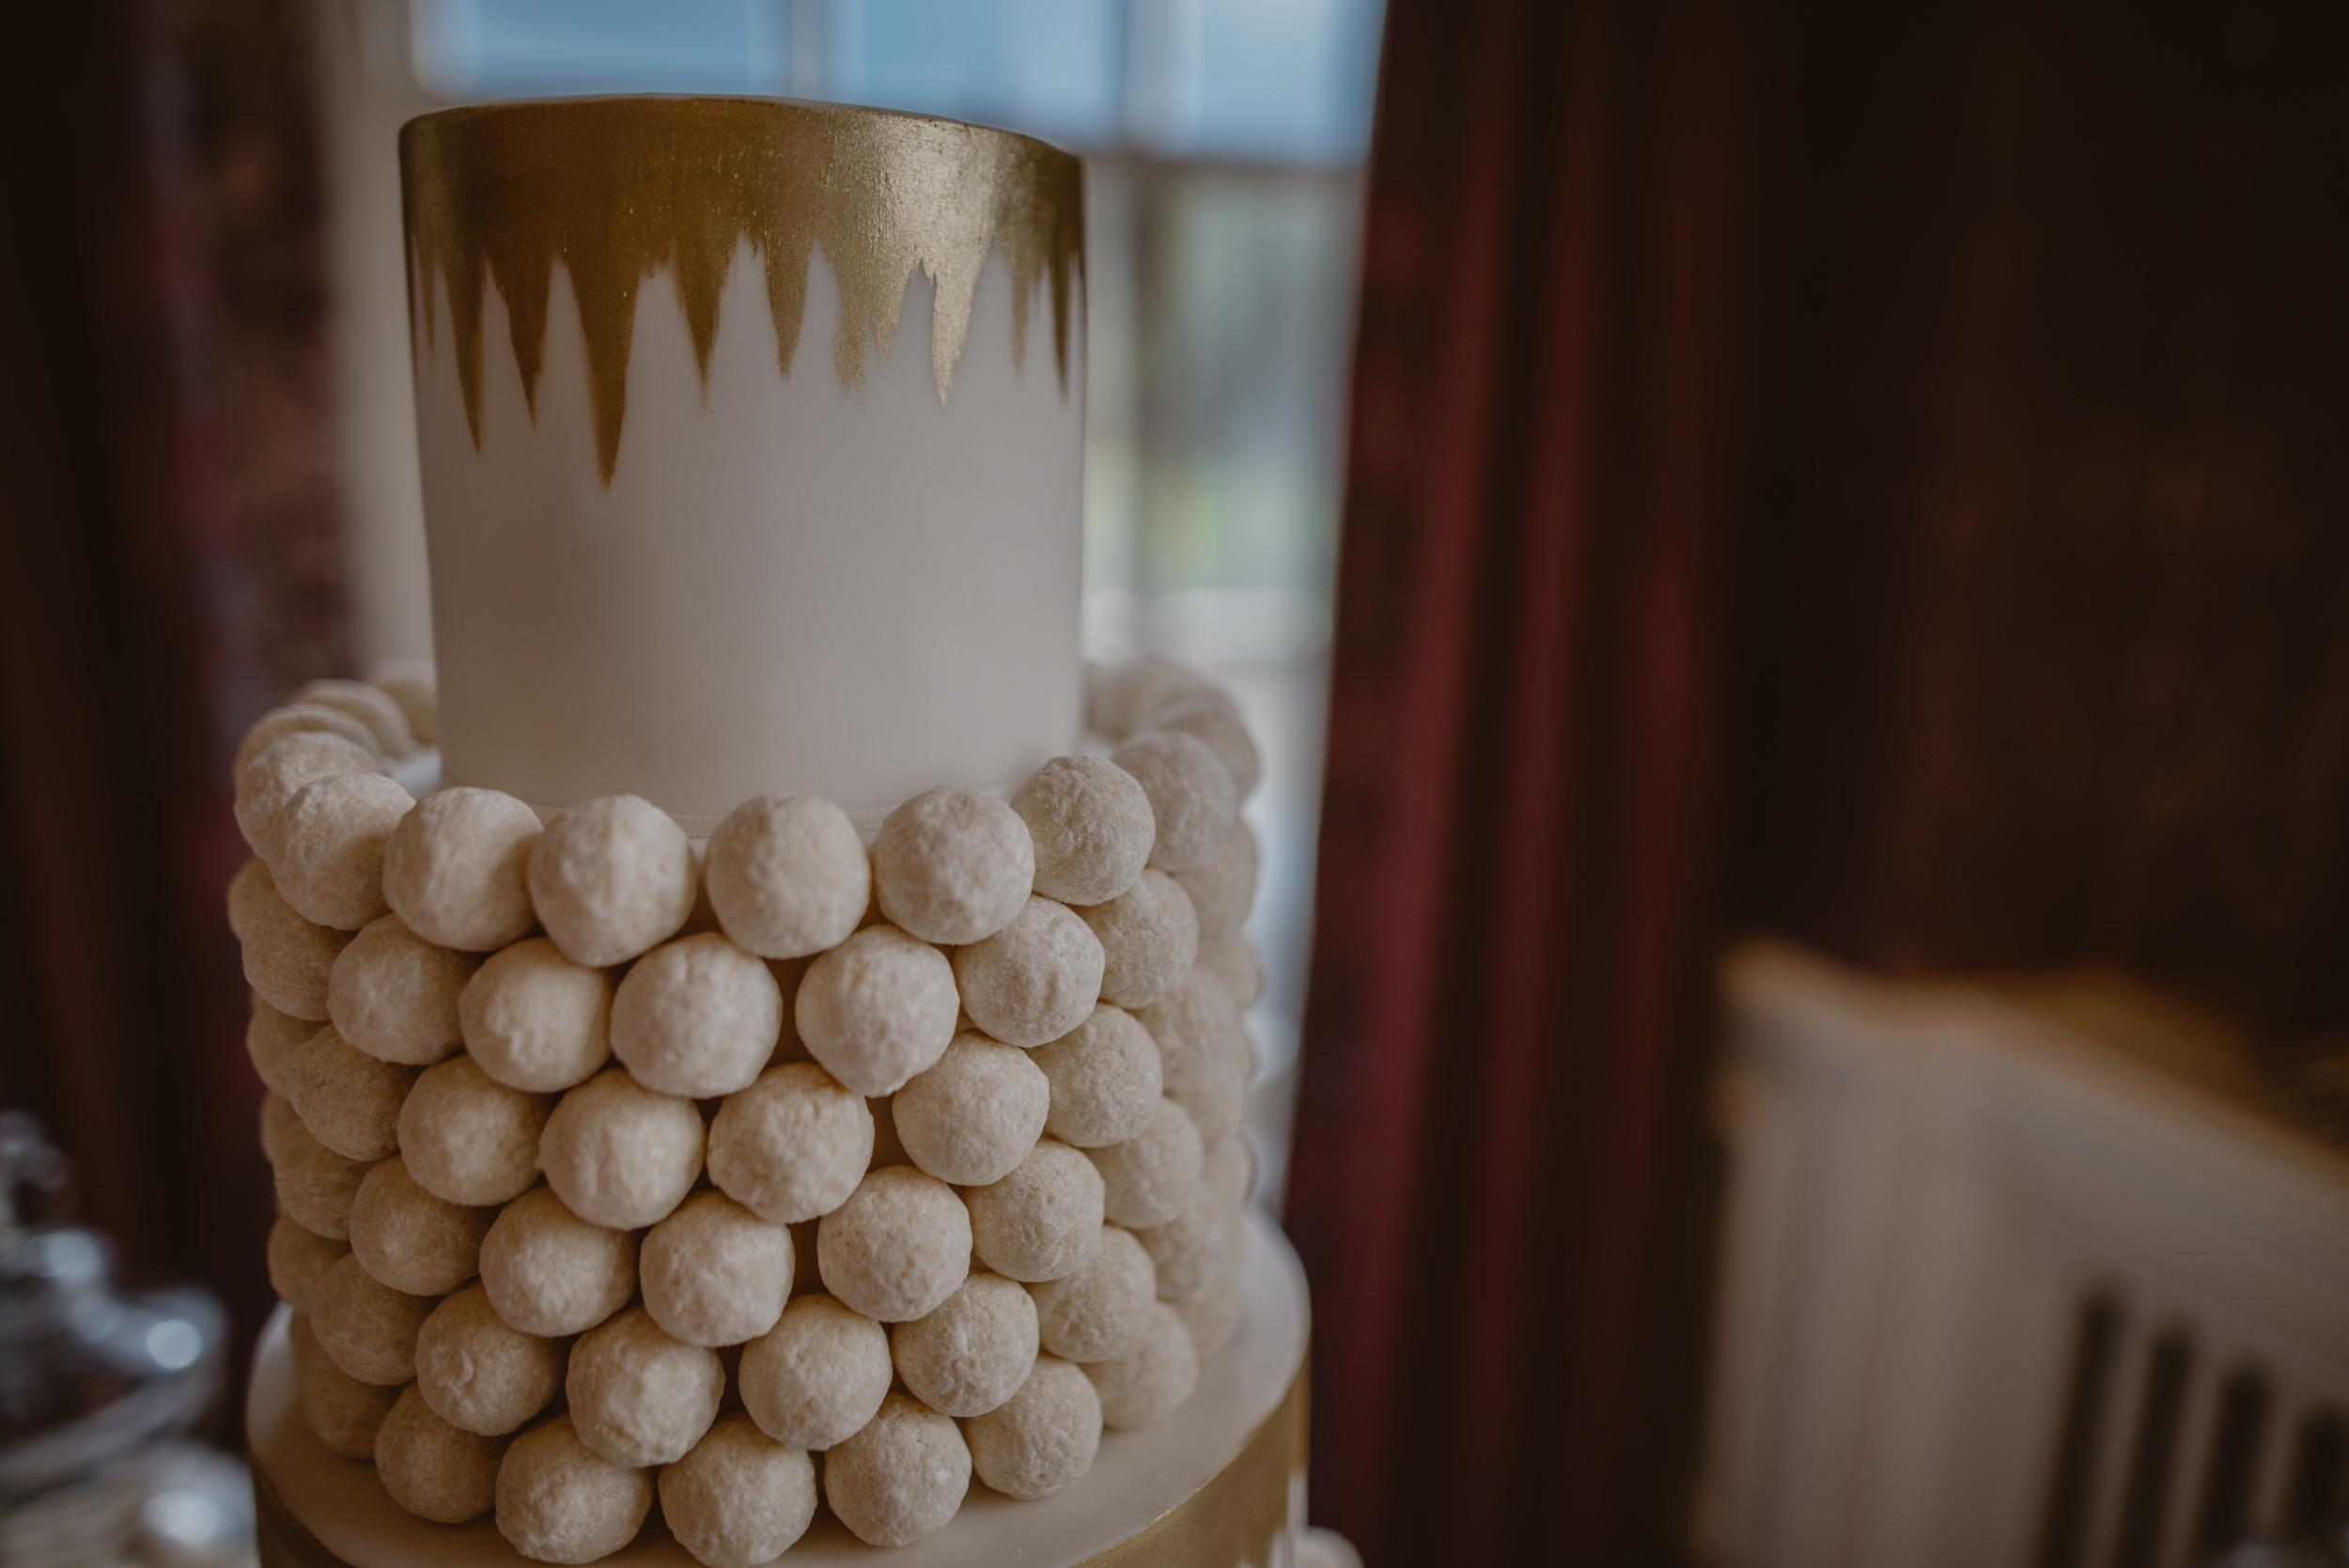 Trisha-and-Roger-wedding-The-Priory-Church-and-Chewton-Glen-Hotel-Christchurch-Manu-Mendoza-Wedding-Photography-275.jpg